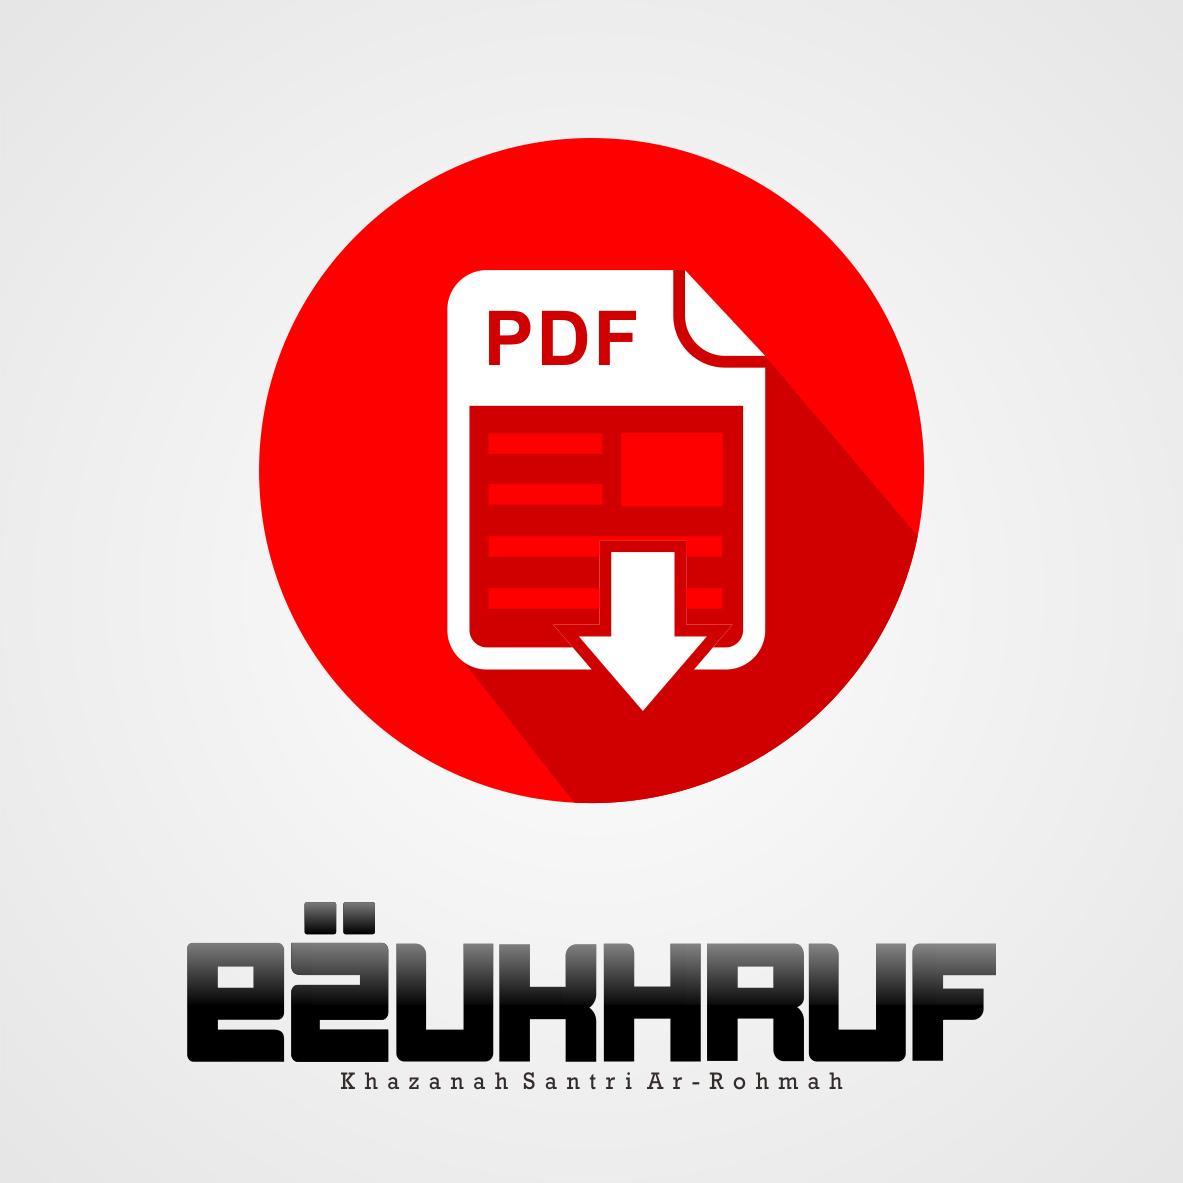 http://isthidayatullah-mlg.blogspot.com/search/label/eZukhruf%20PDF